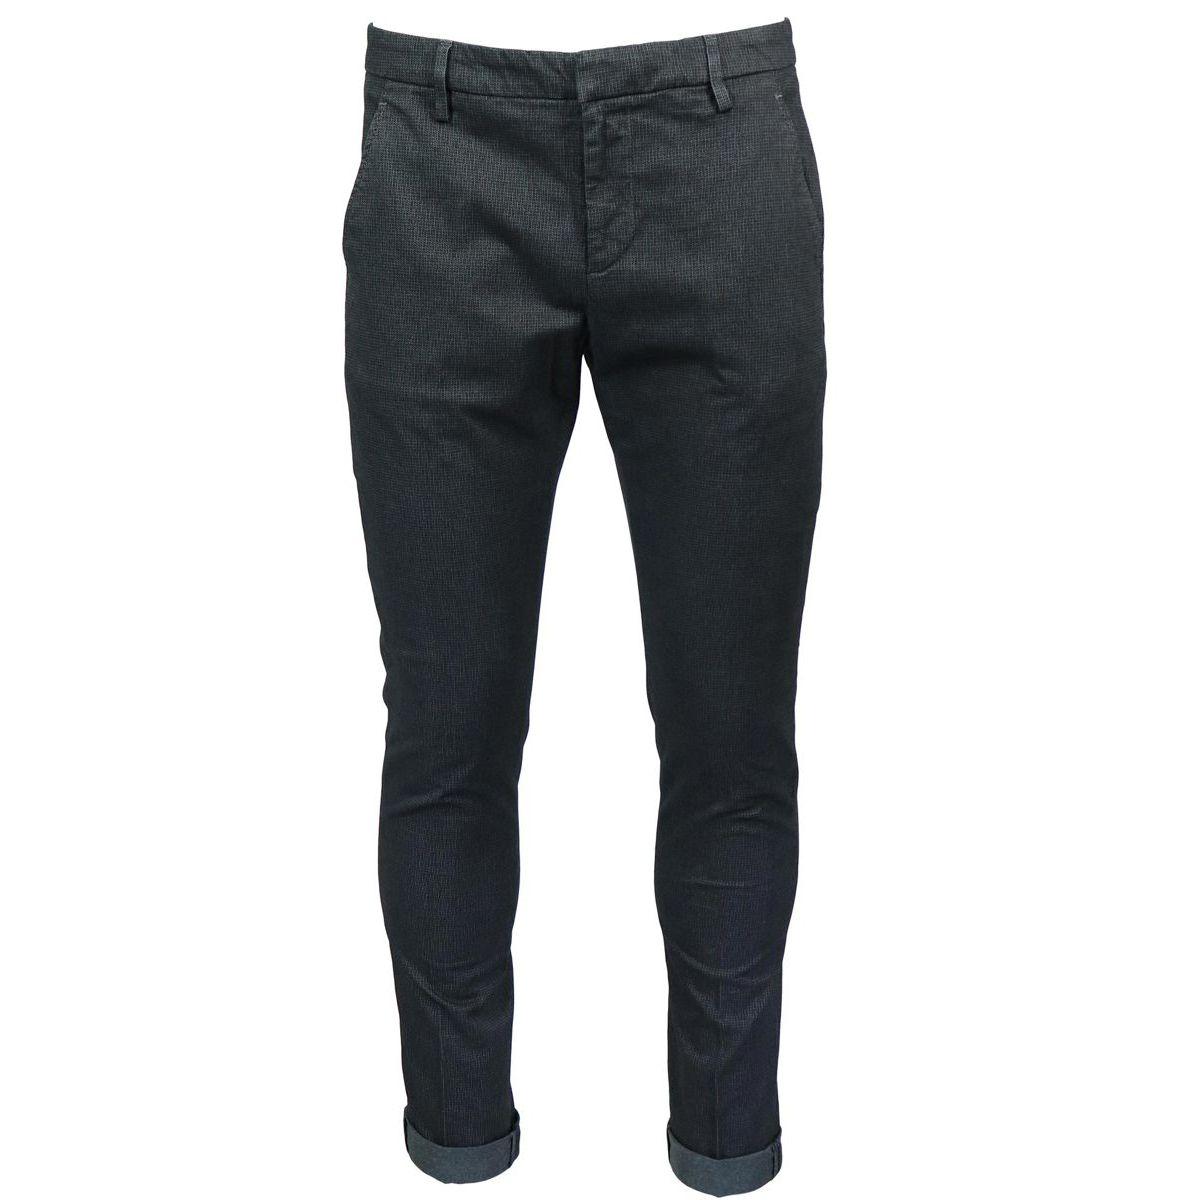 Gaubert Tasca stretch pants Black Dondup